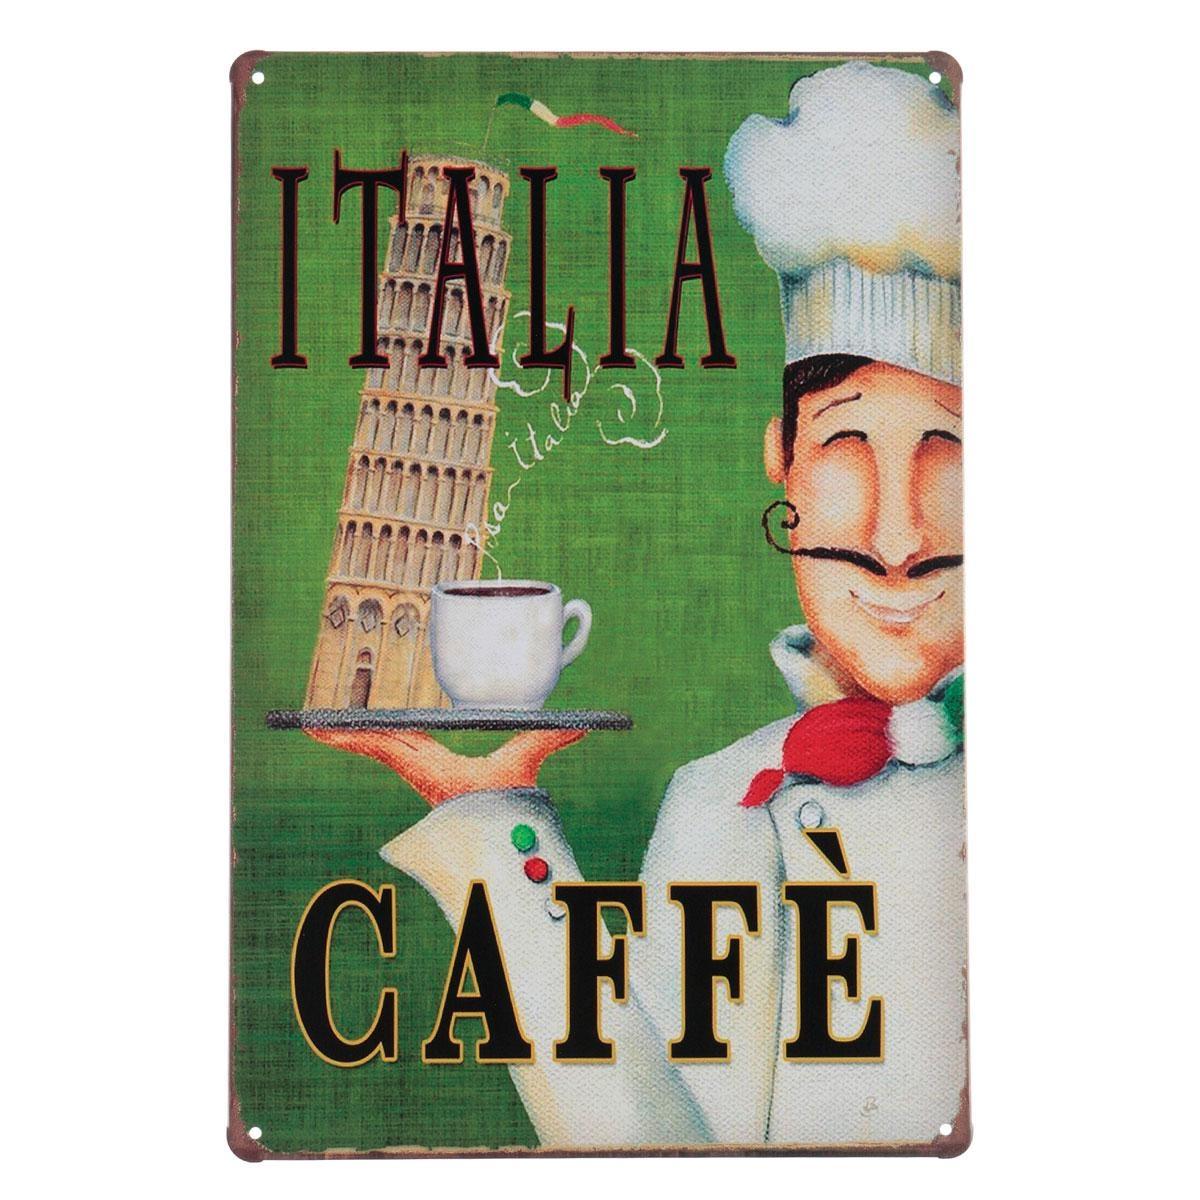 Coffee Menu Vintage Tin Sign Bar Pub Cafe Home Wall Decor Retro Inside Coffee Theme Metal Wall Art (Image 7 of 20)